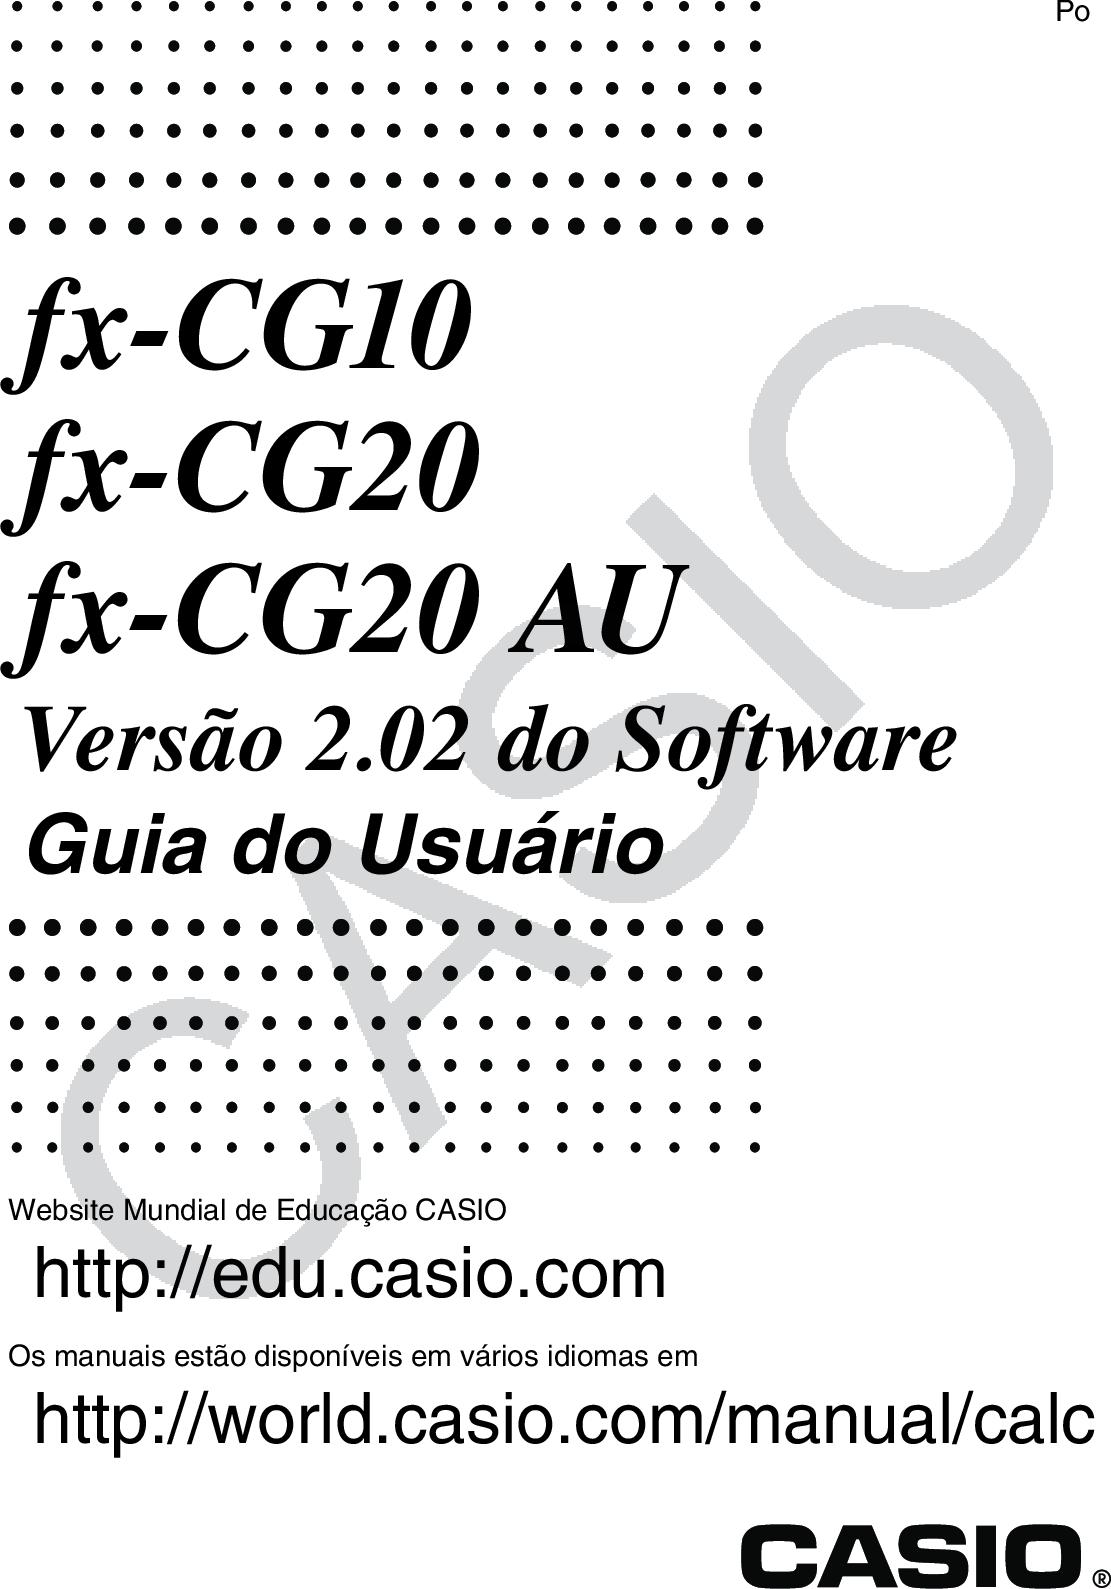 Casio Fx CG10_CG20_CG20 AU CG10_20_Soft CG10 20 Soft PT